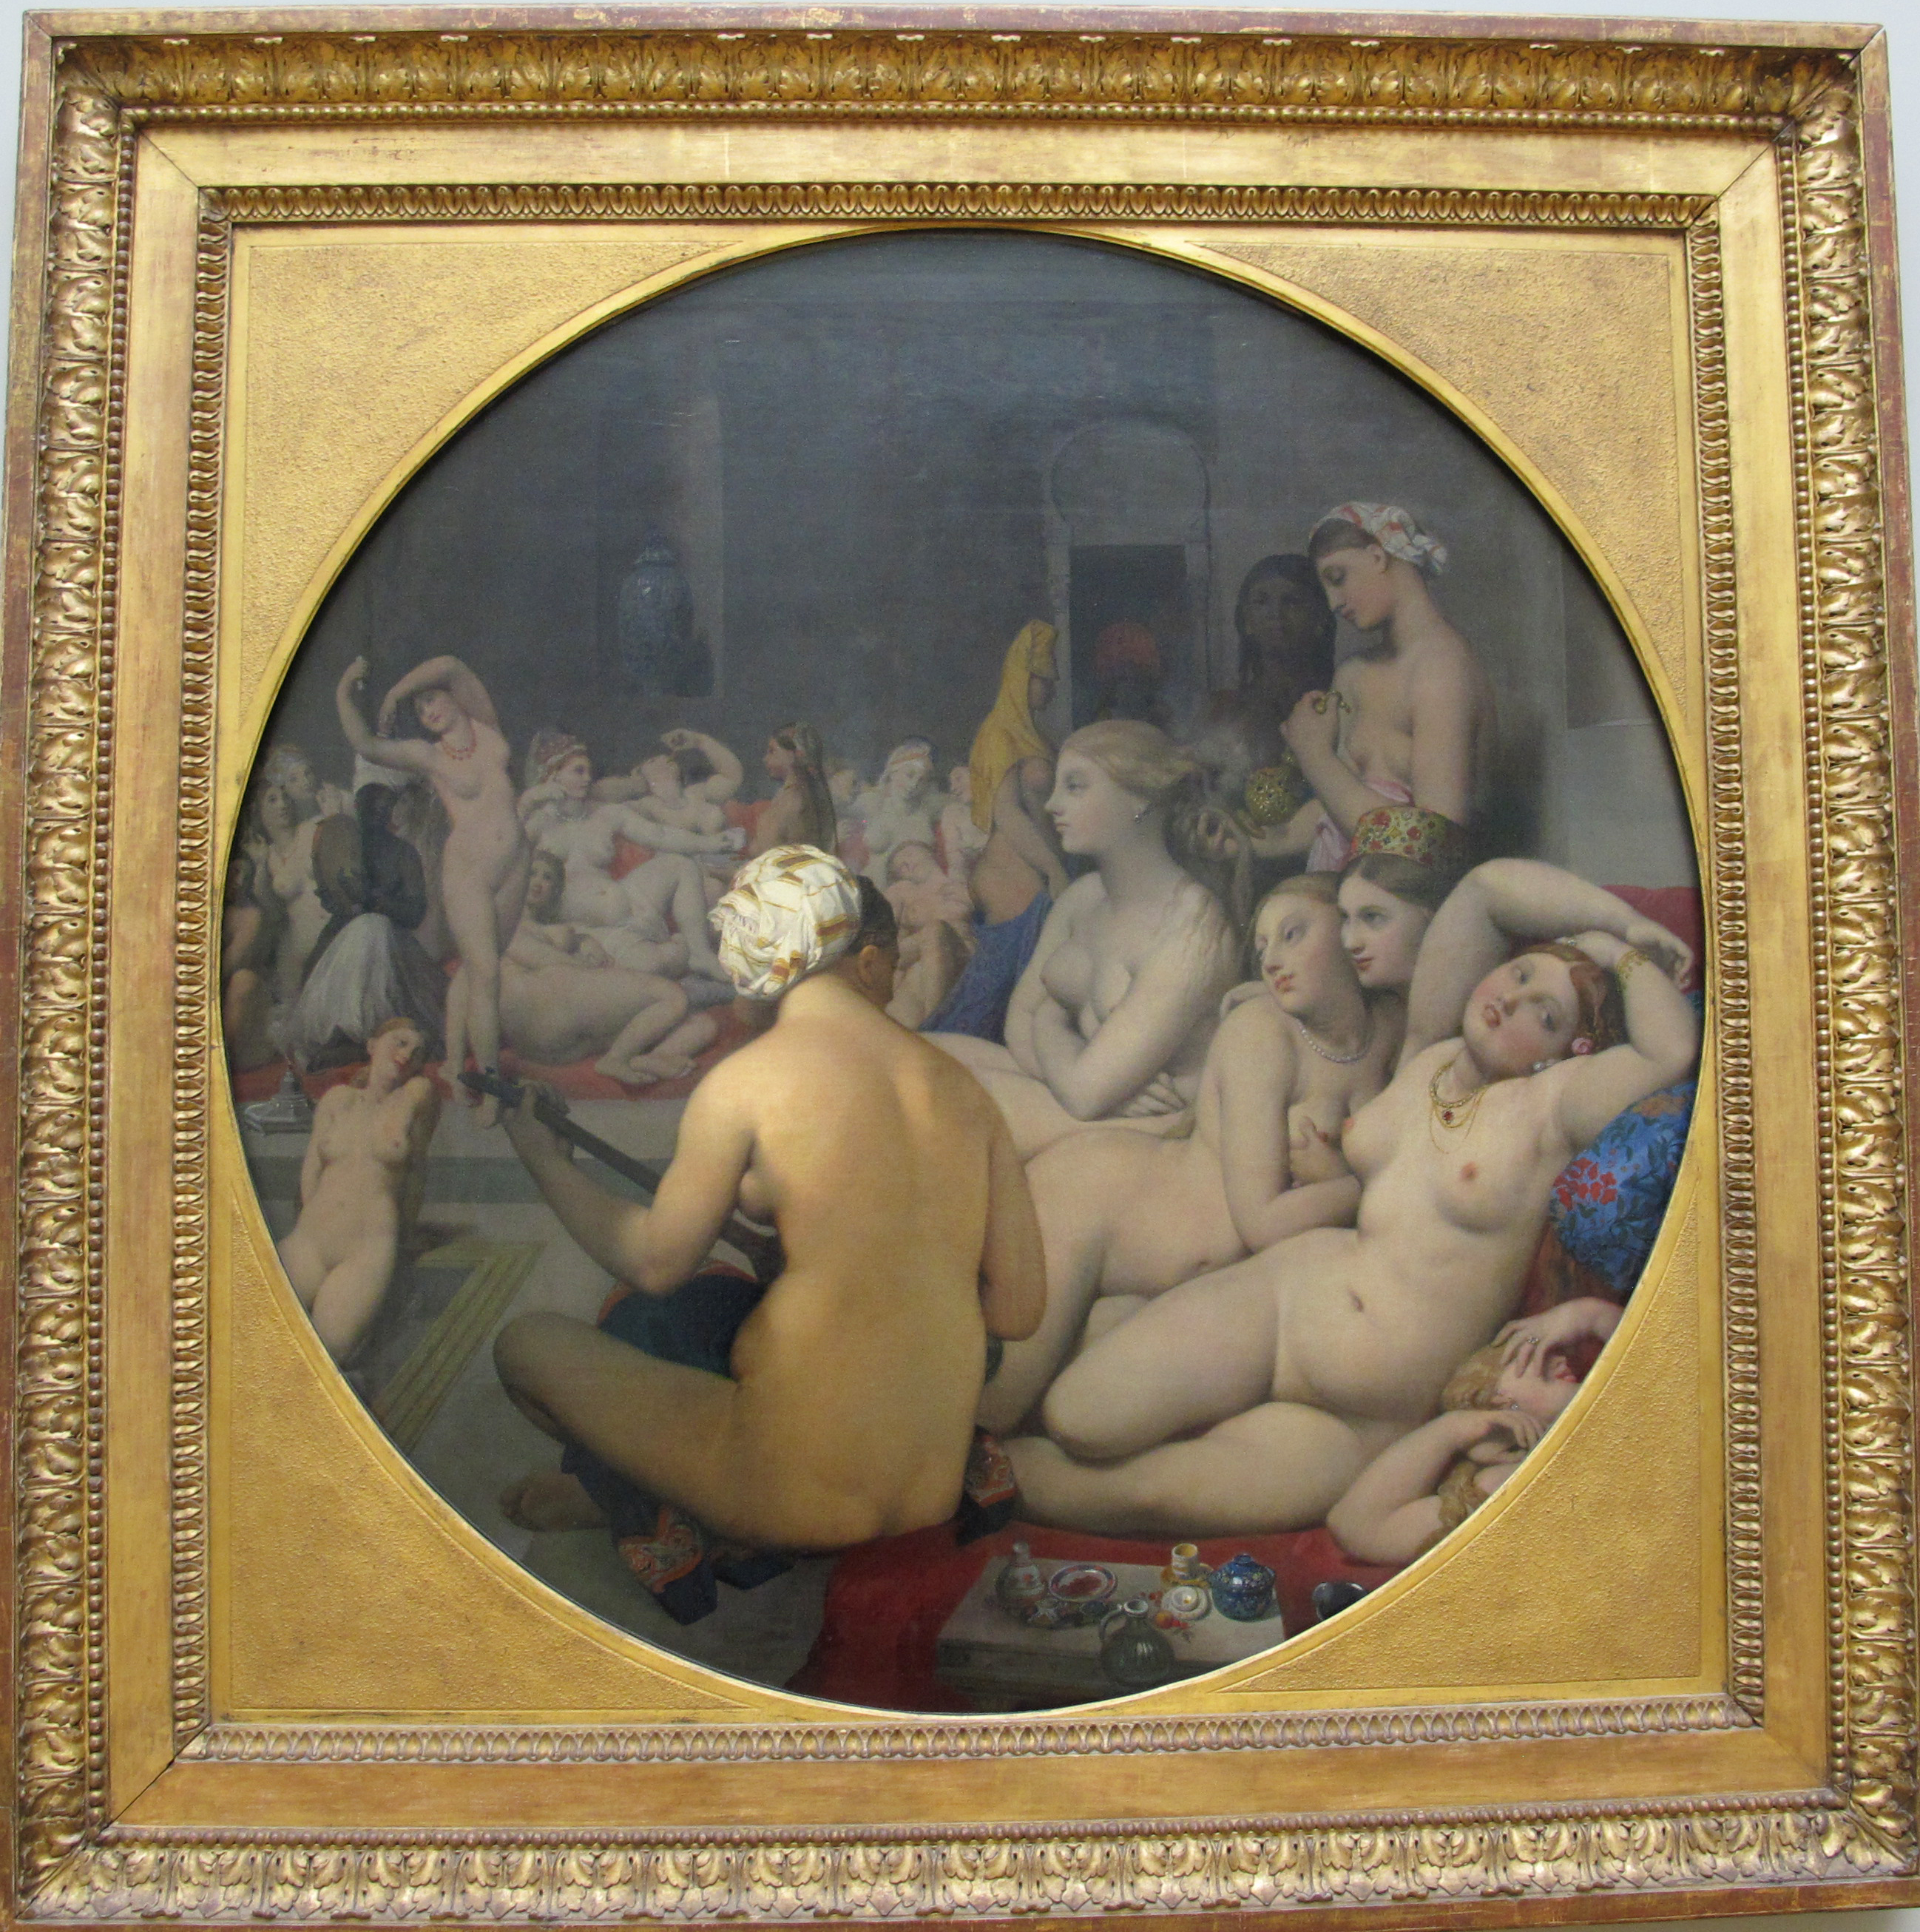 File:Jean-auguste-dominique ingres, il bagno turco, 1862, 01.JPG ...